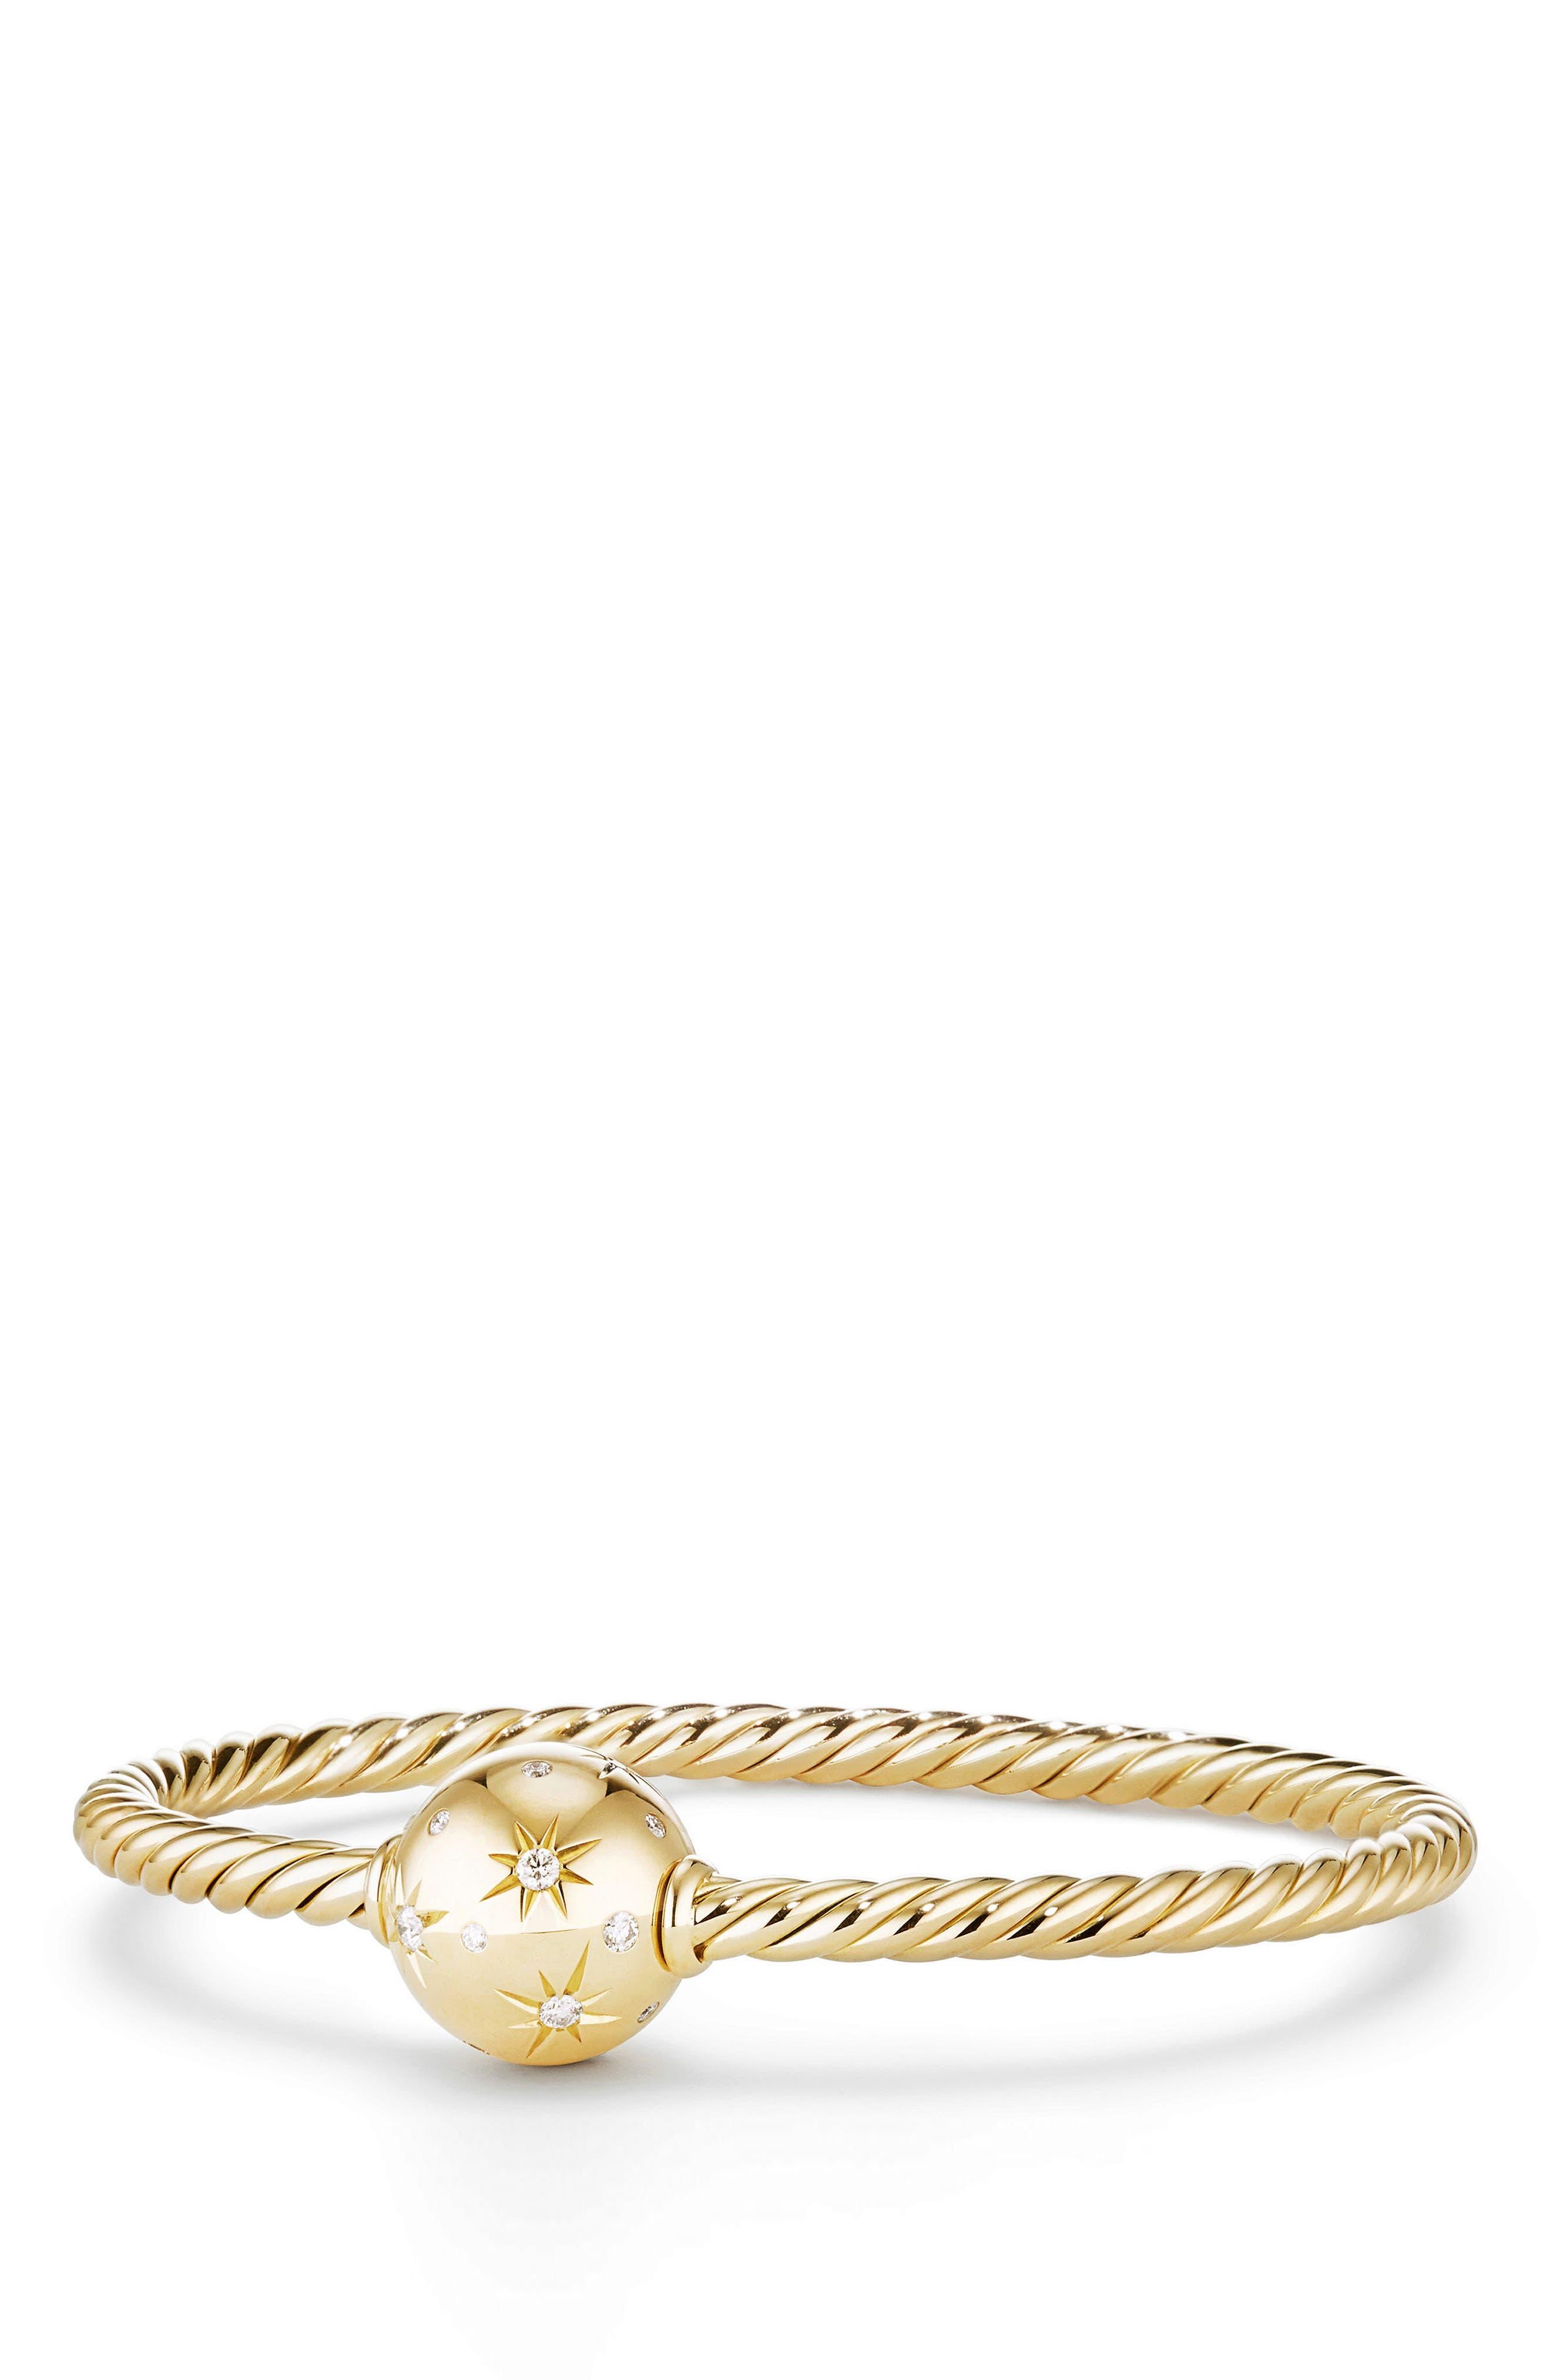 Main Image - David Yurman Solari Station Bracelet with Diamonds in 18K Gold